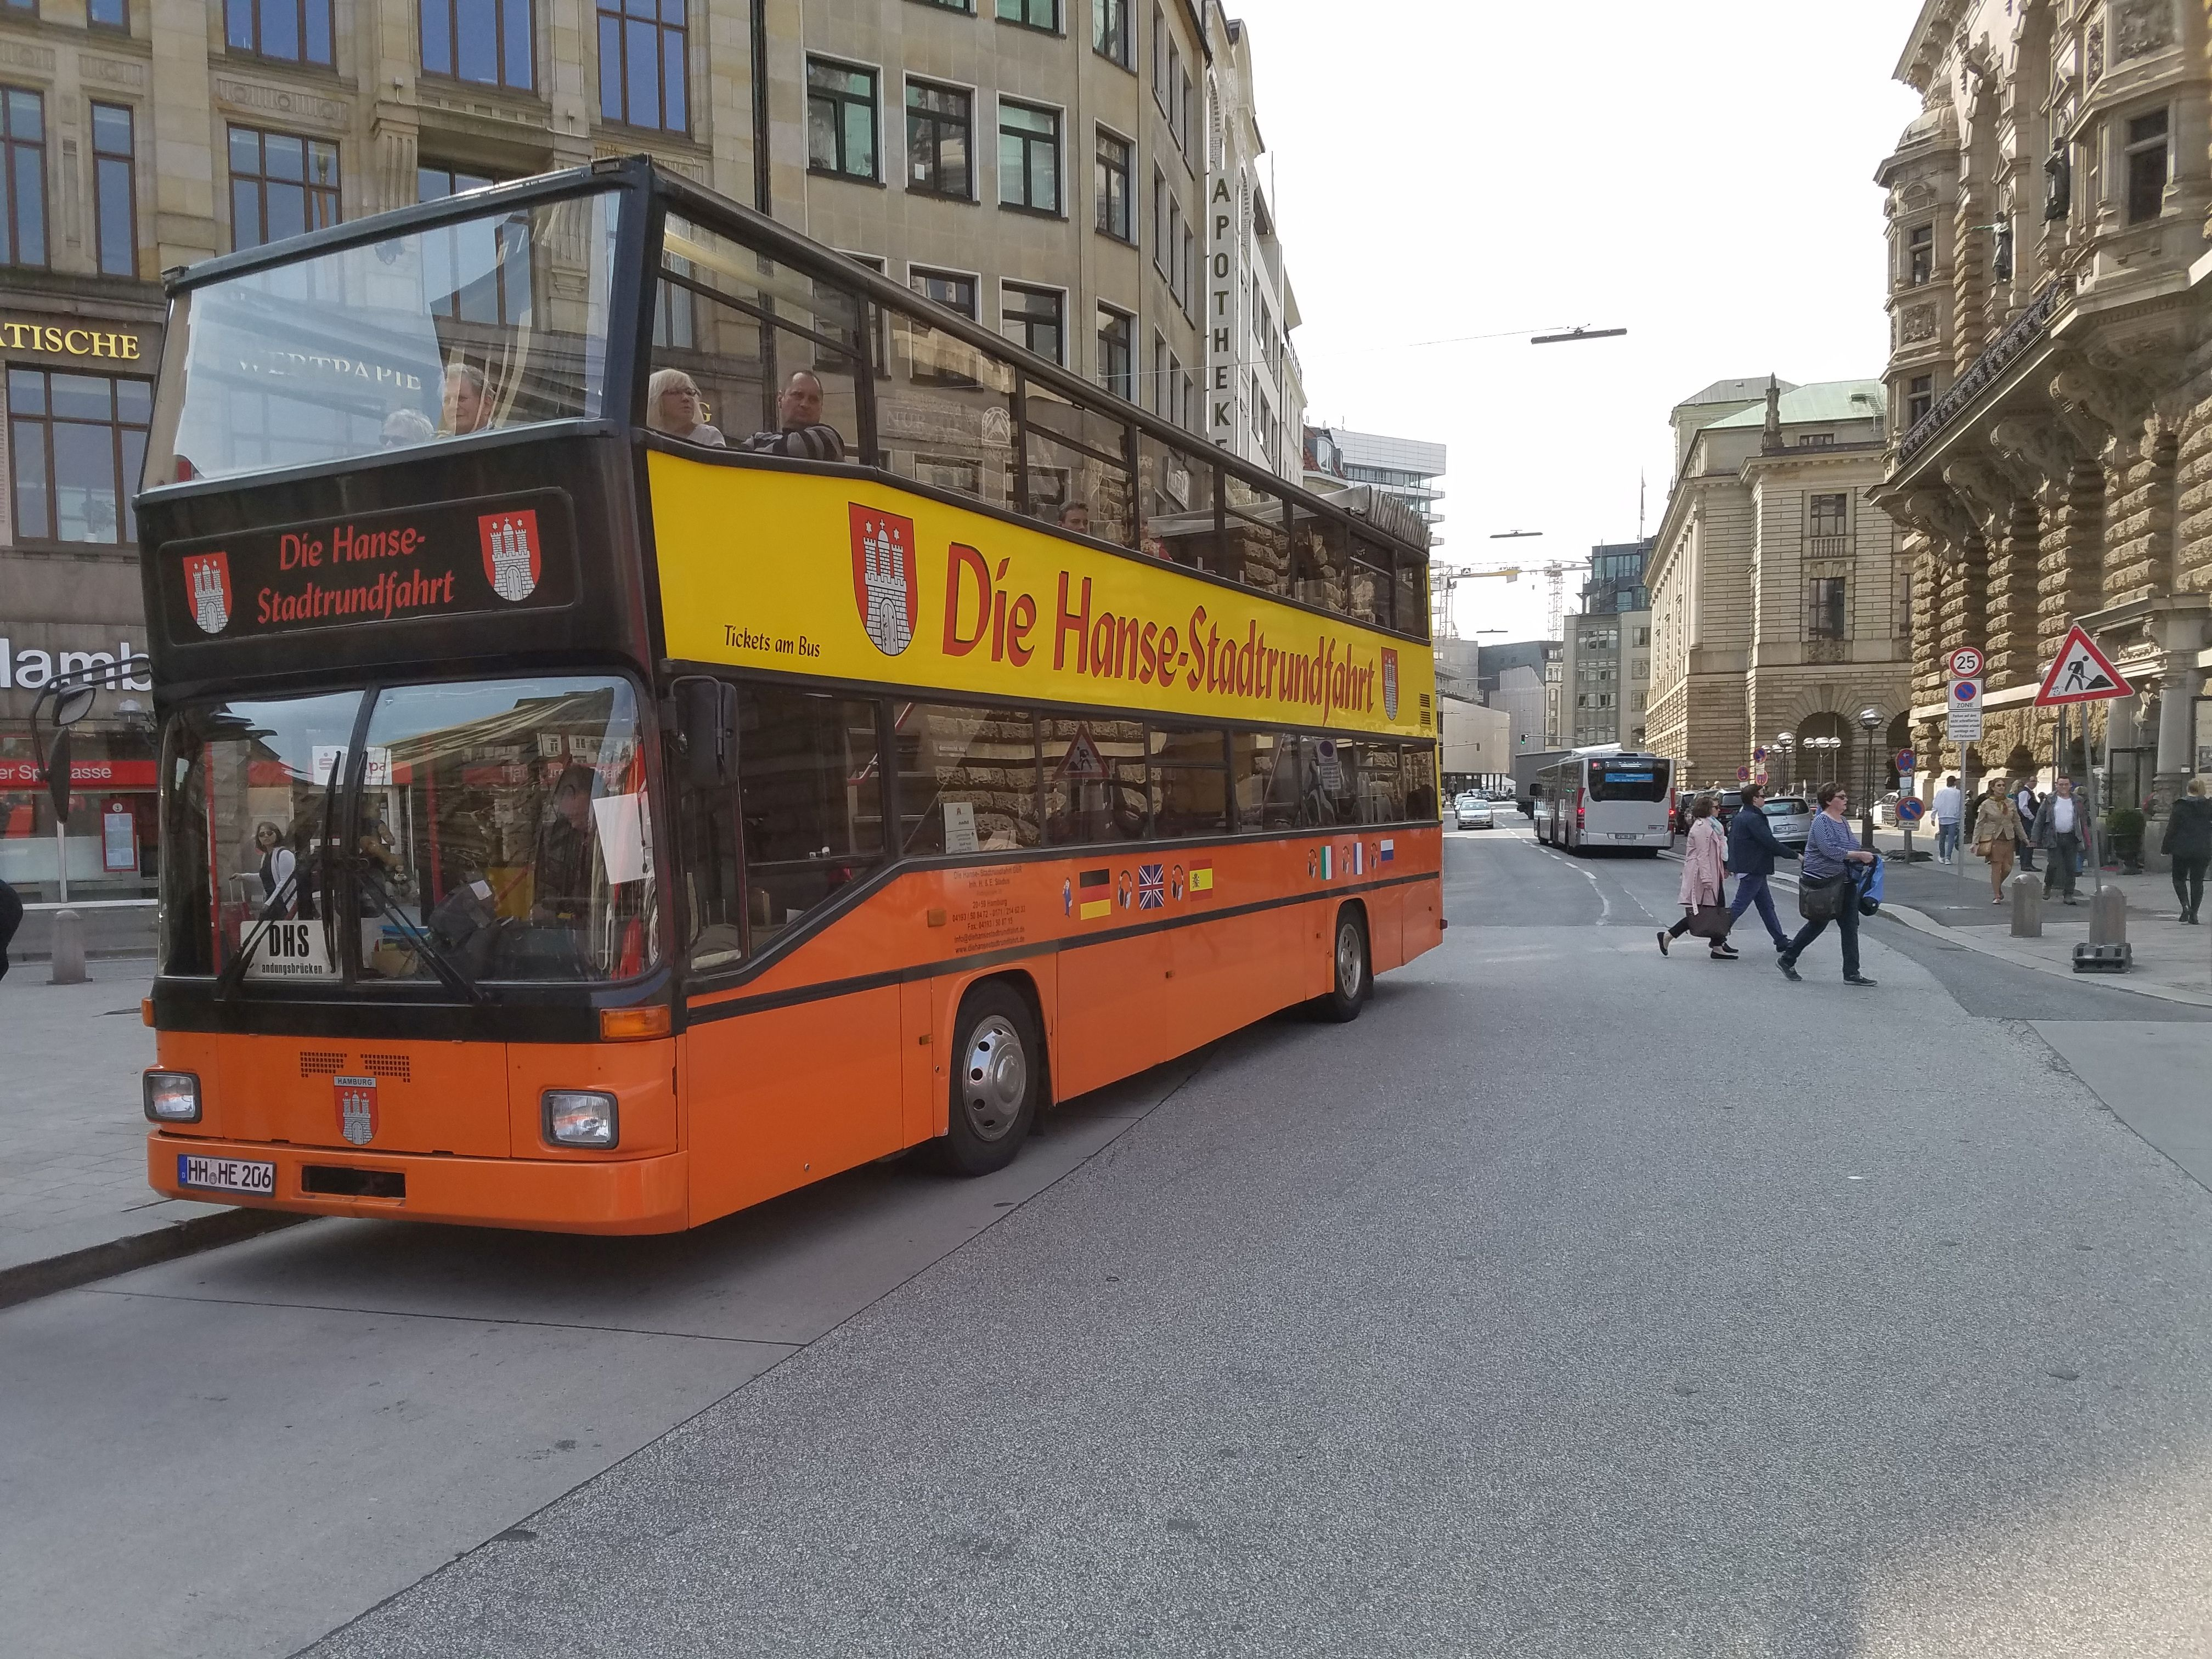 Foto: Bus 3899, Typ D91, Stadtrundfahrtbus HH HE 206, Hamburg, März 2017